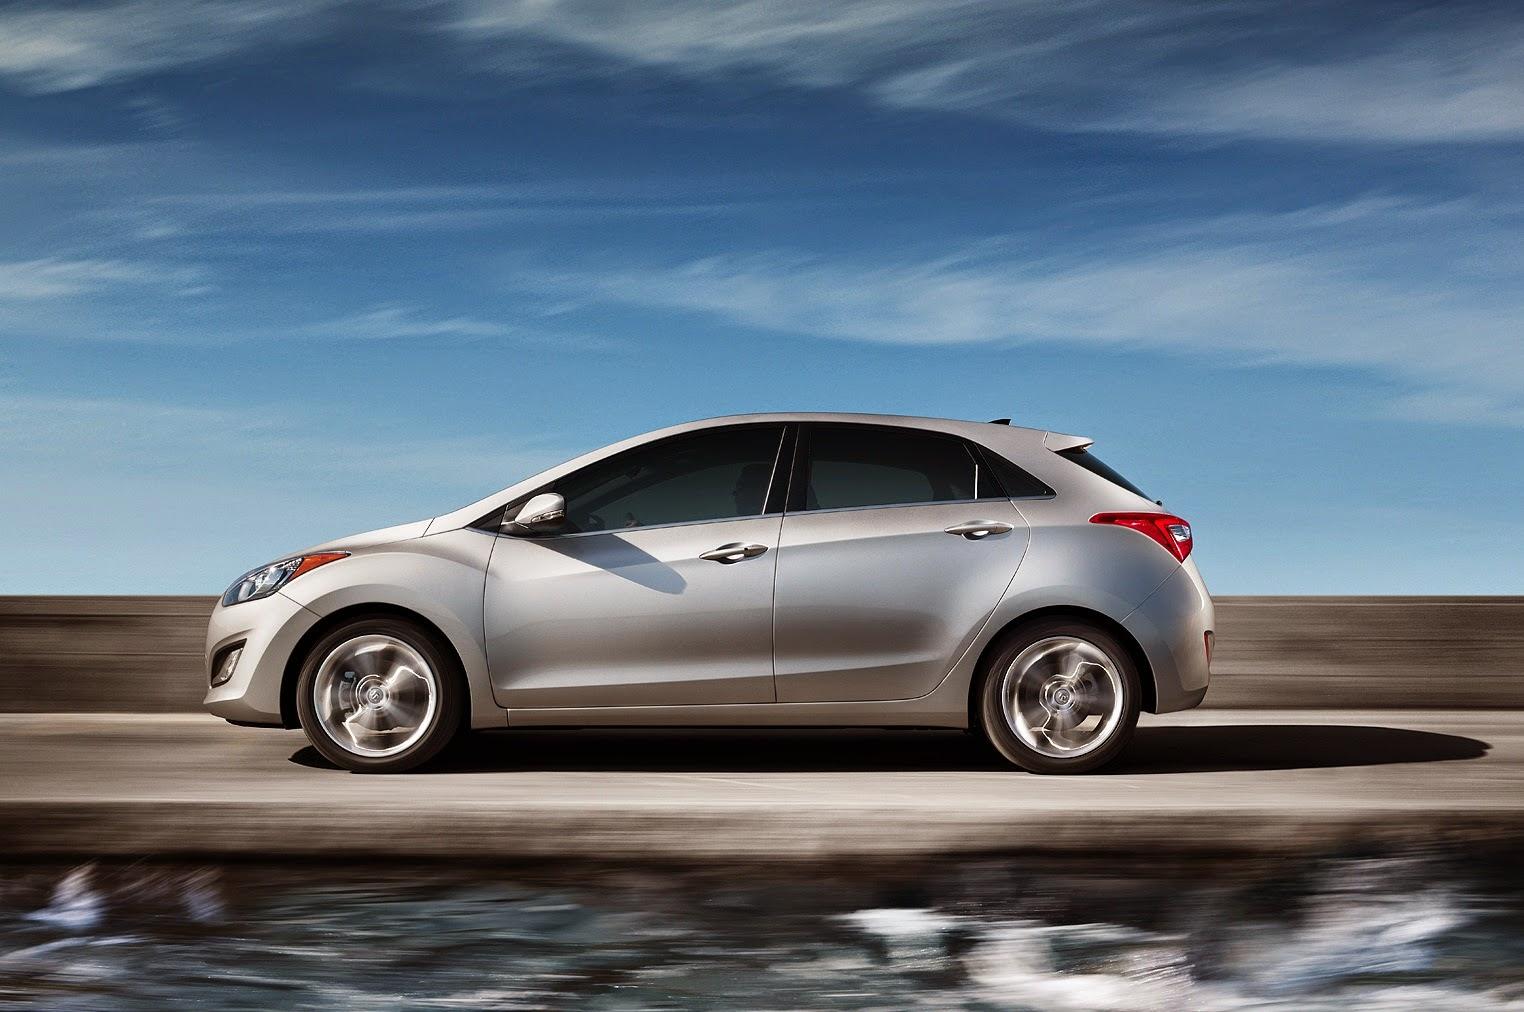 Hyundai Elantra Gt Hatchback Review Features Amp Specs Car